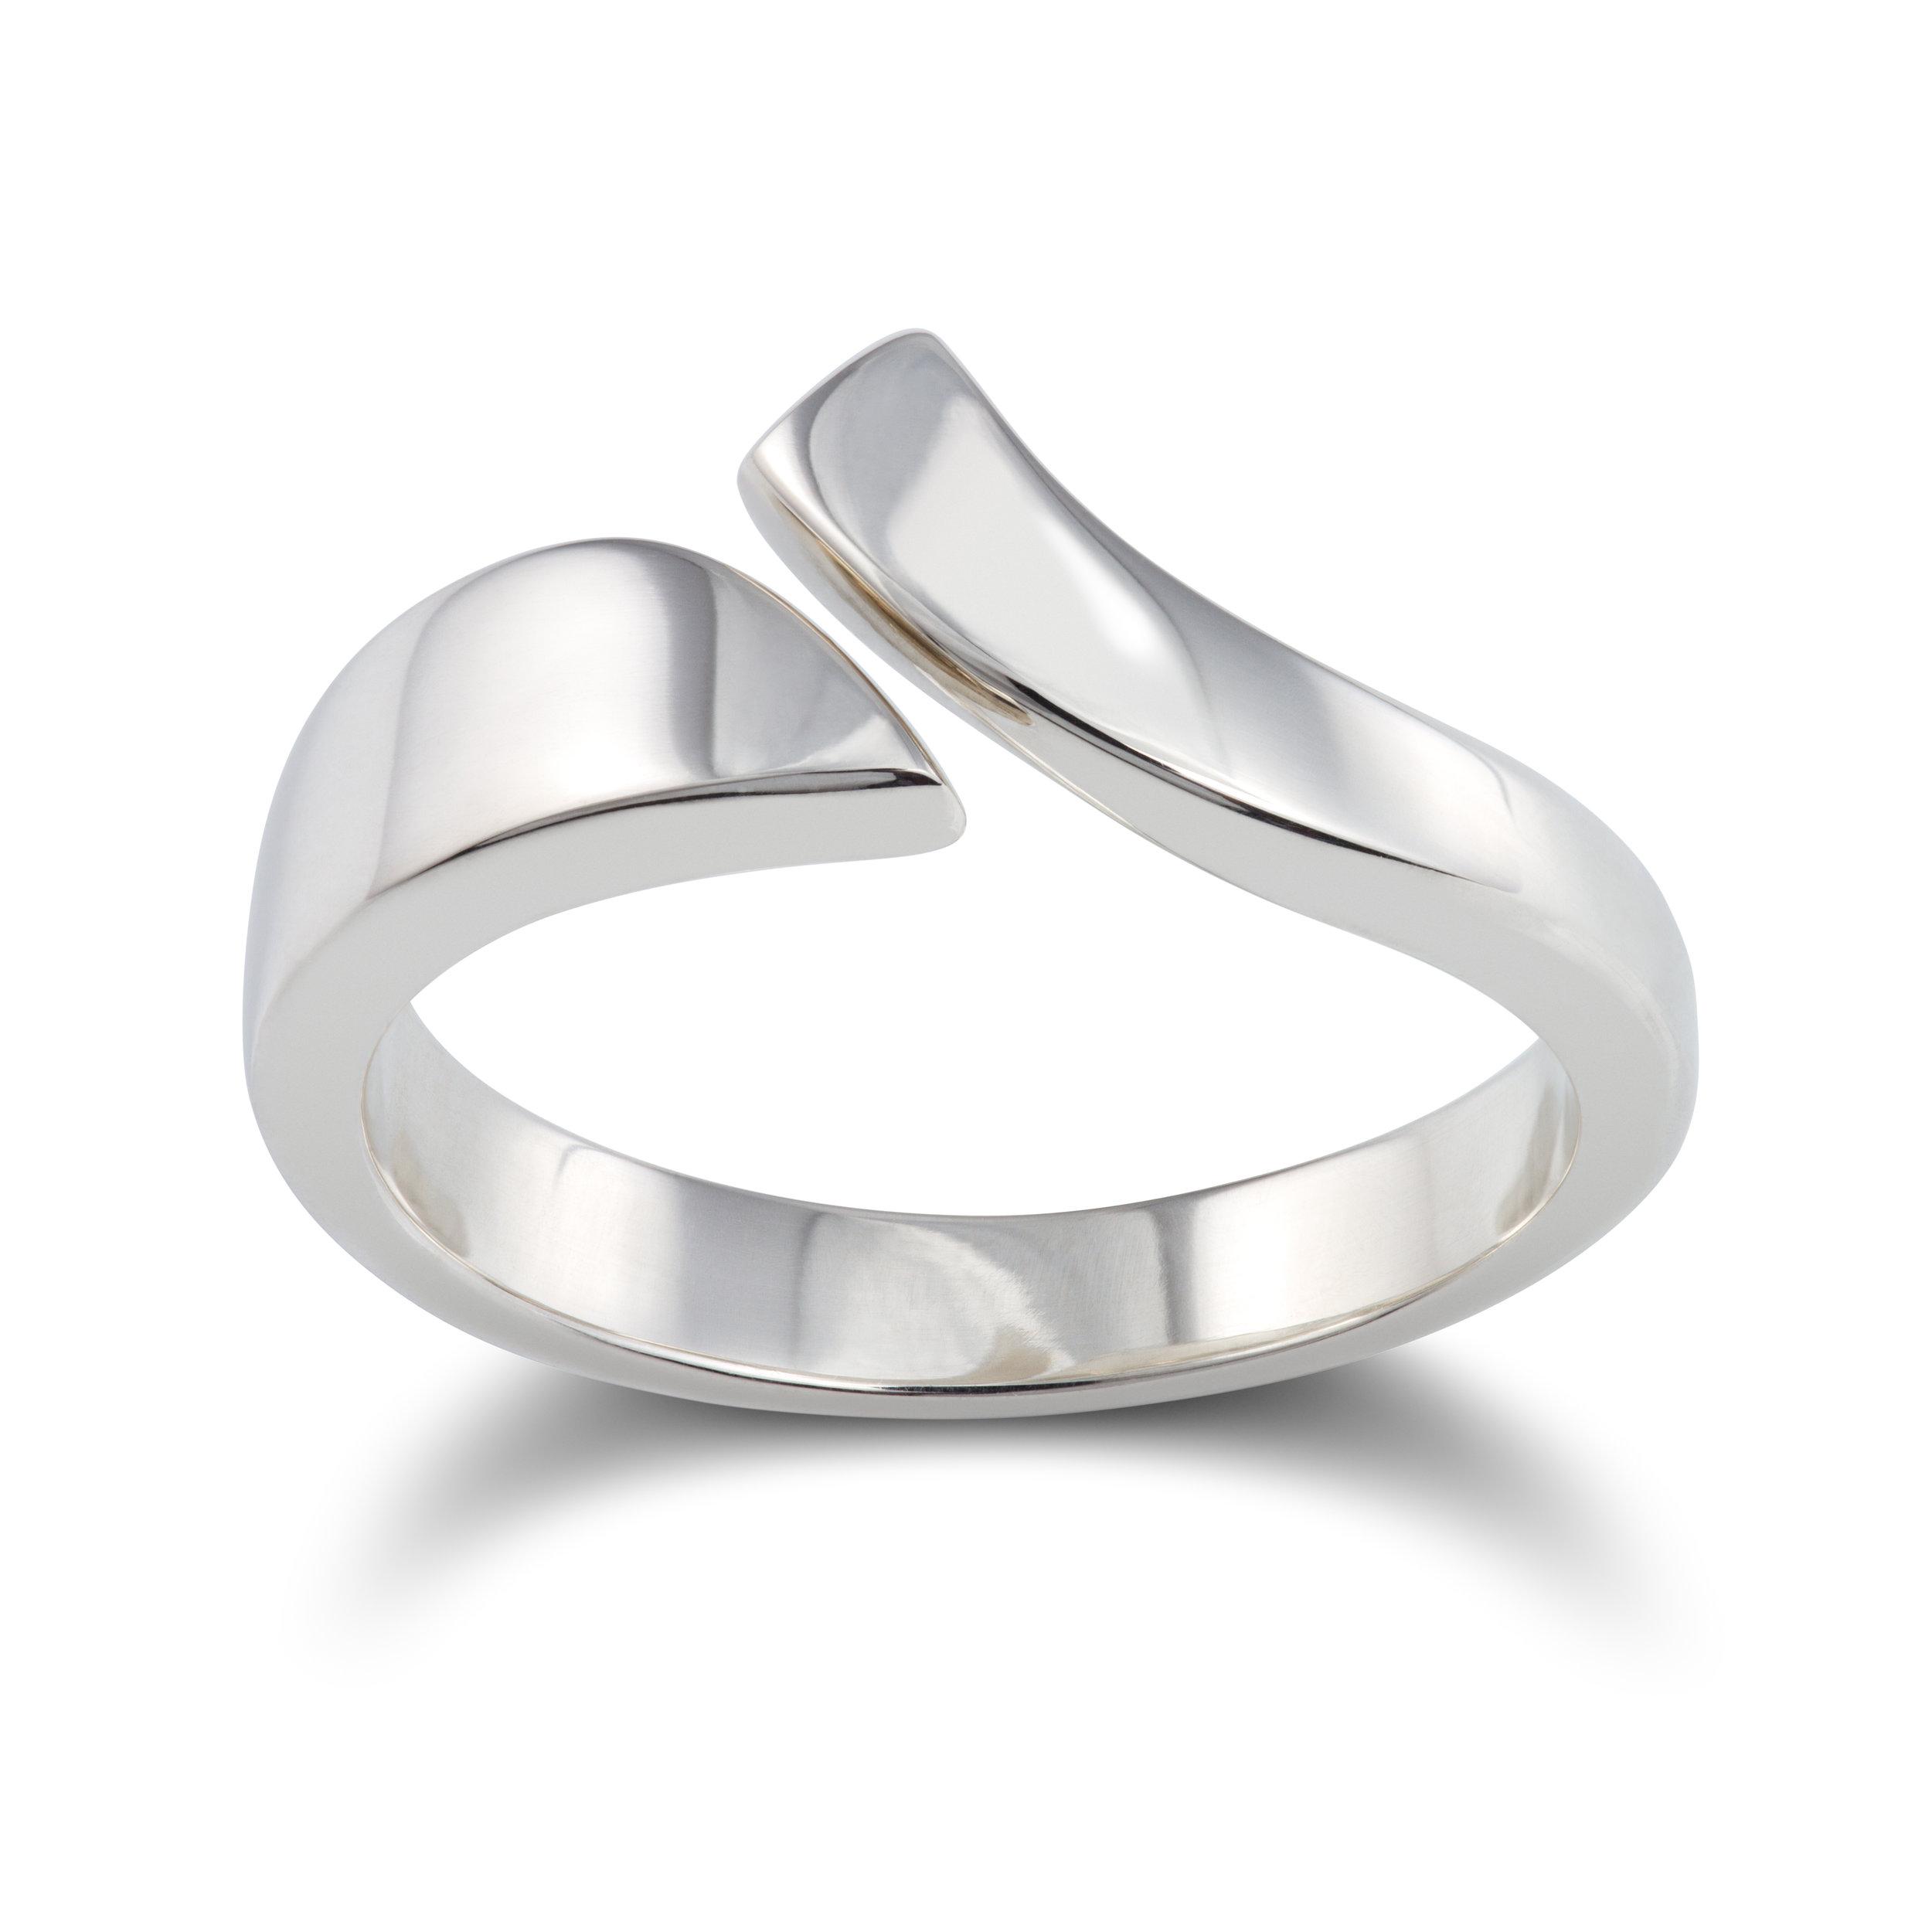 Silver dress ring - £125